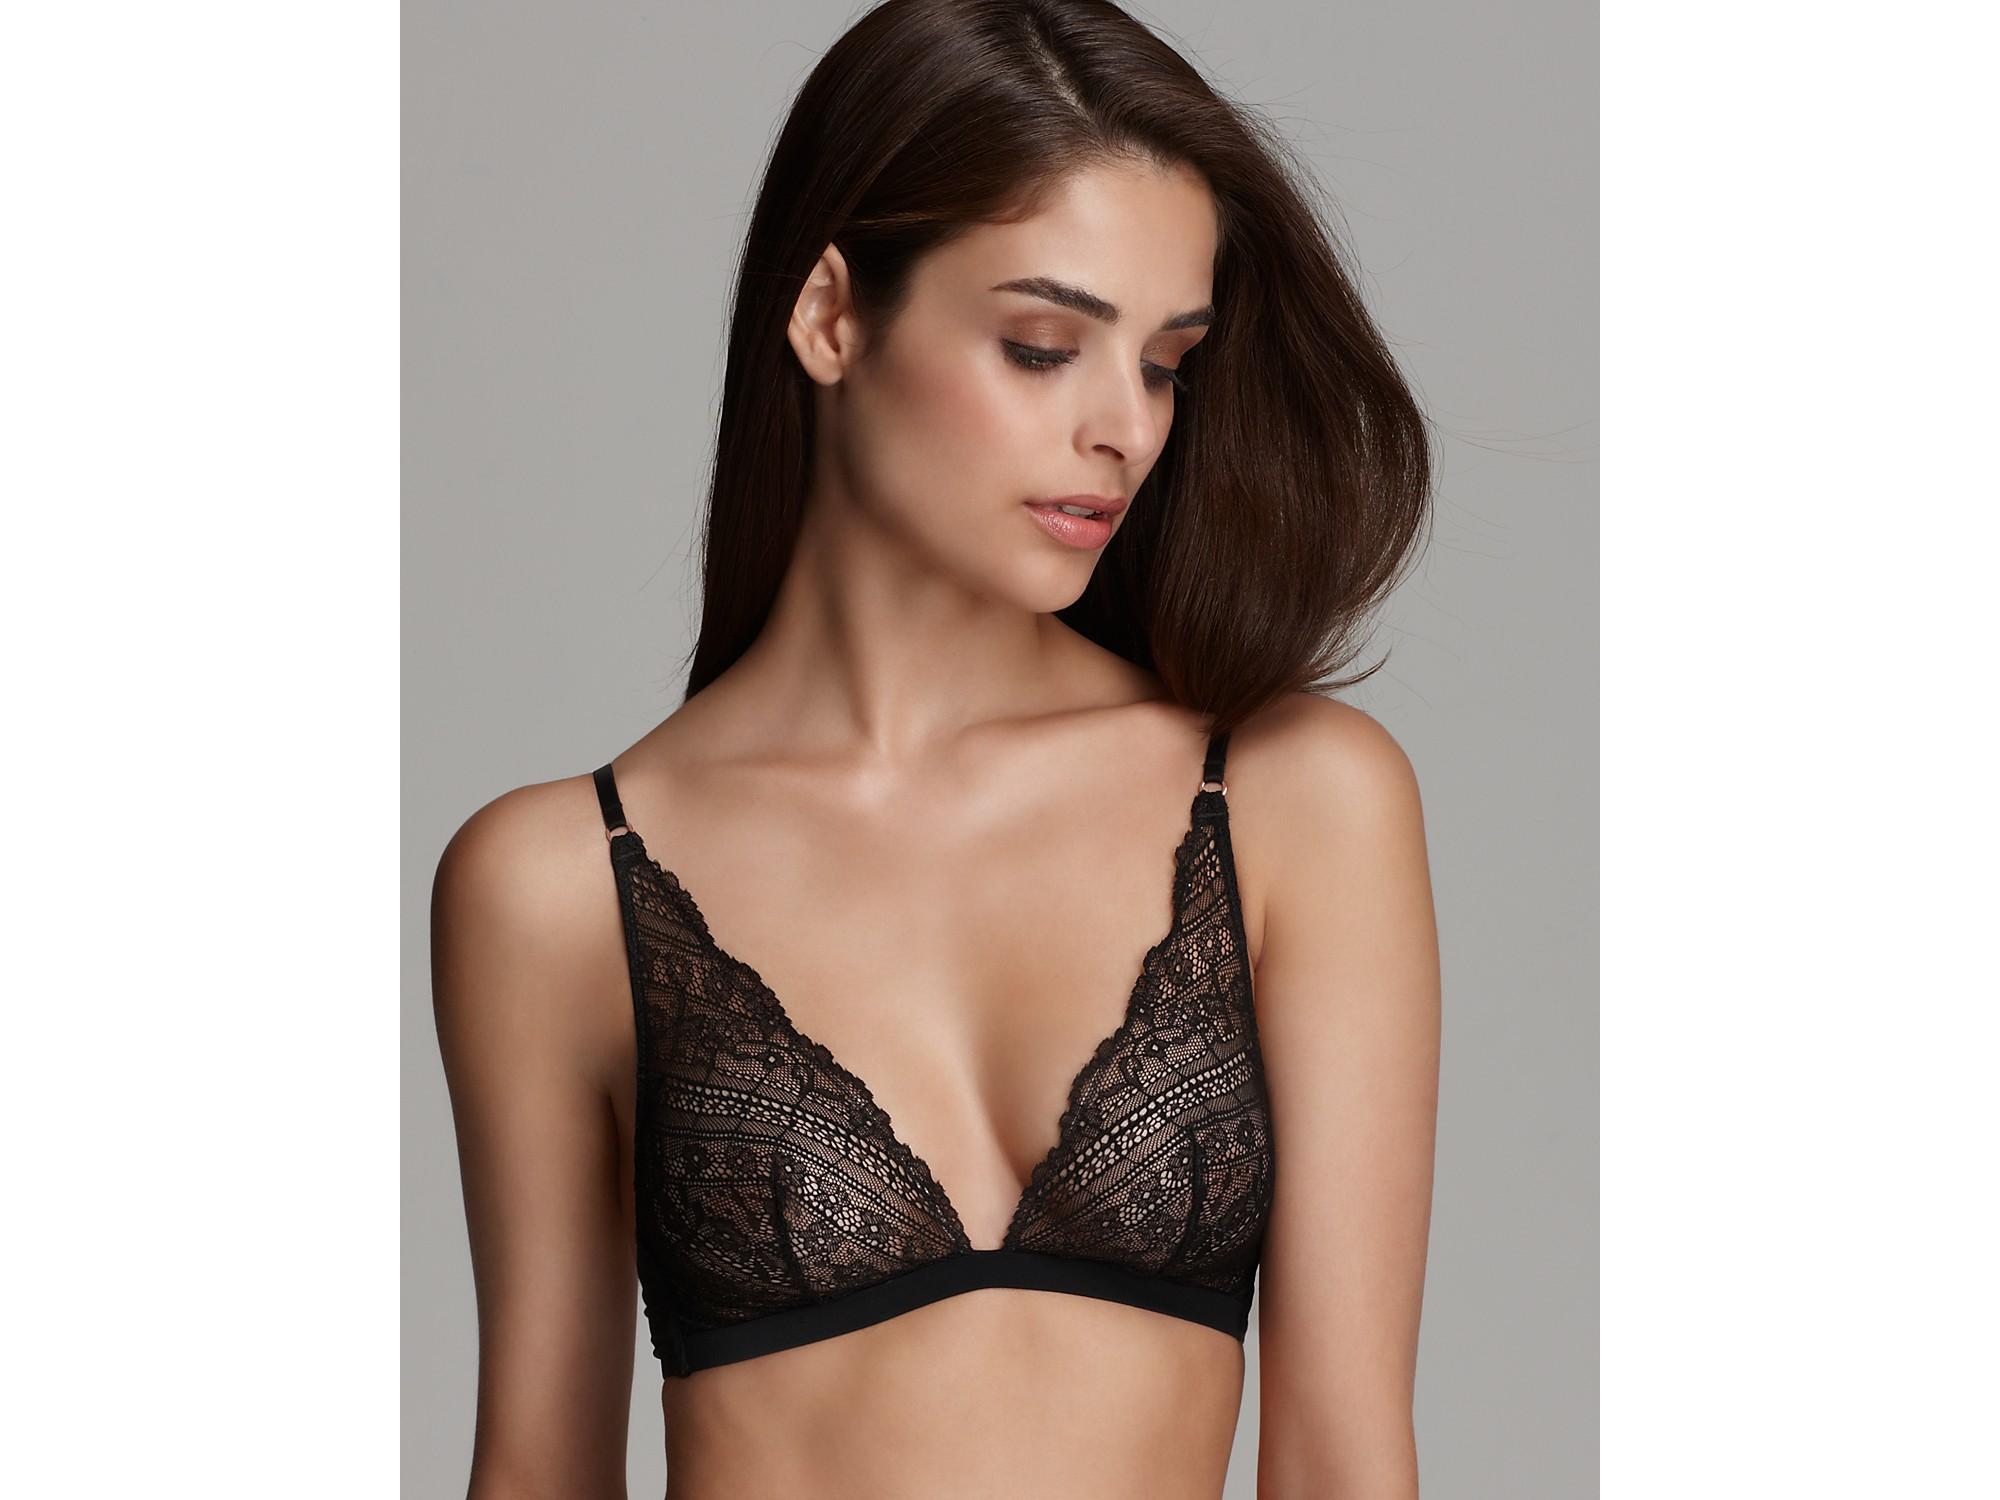 d67f302e97 Lyst - Calvin Klein Underwear Envy Lace Triangle Bra in Black